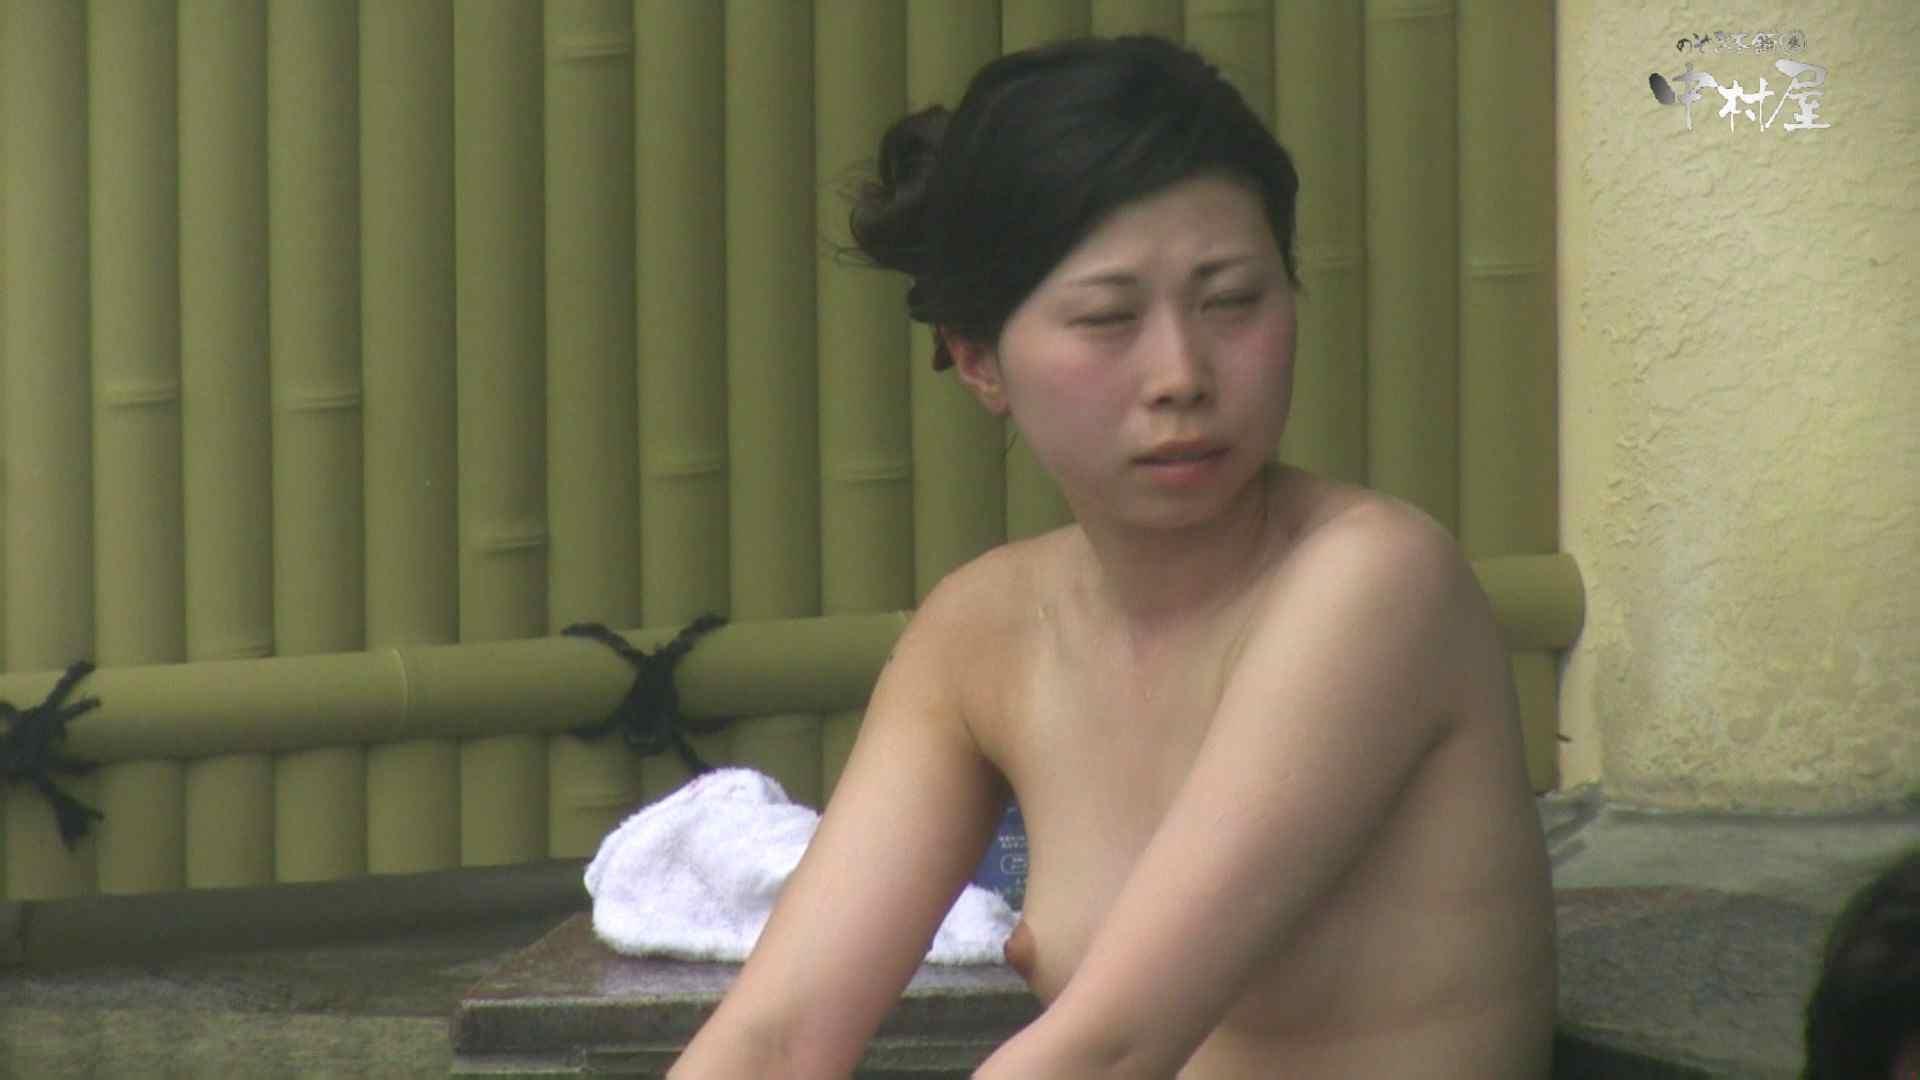 Aquaな露天風呂Vol.891 0 | 0  69連発 61